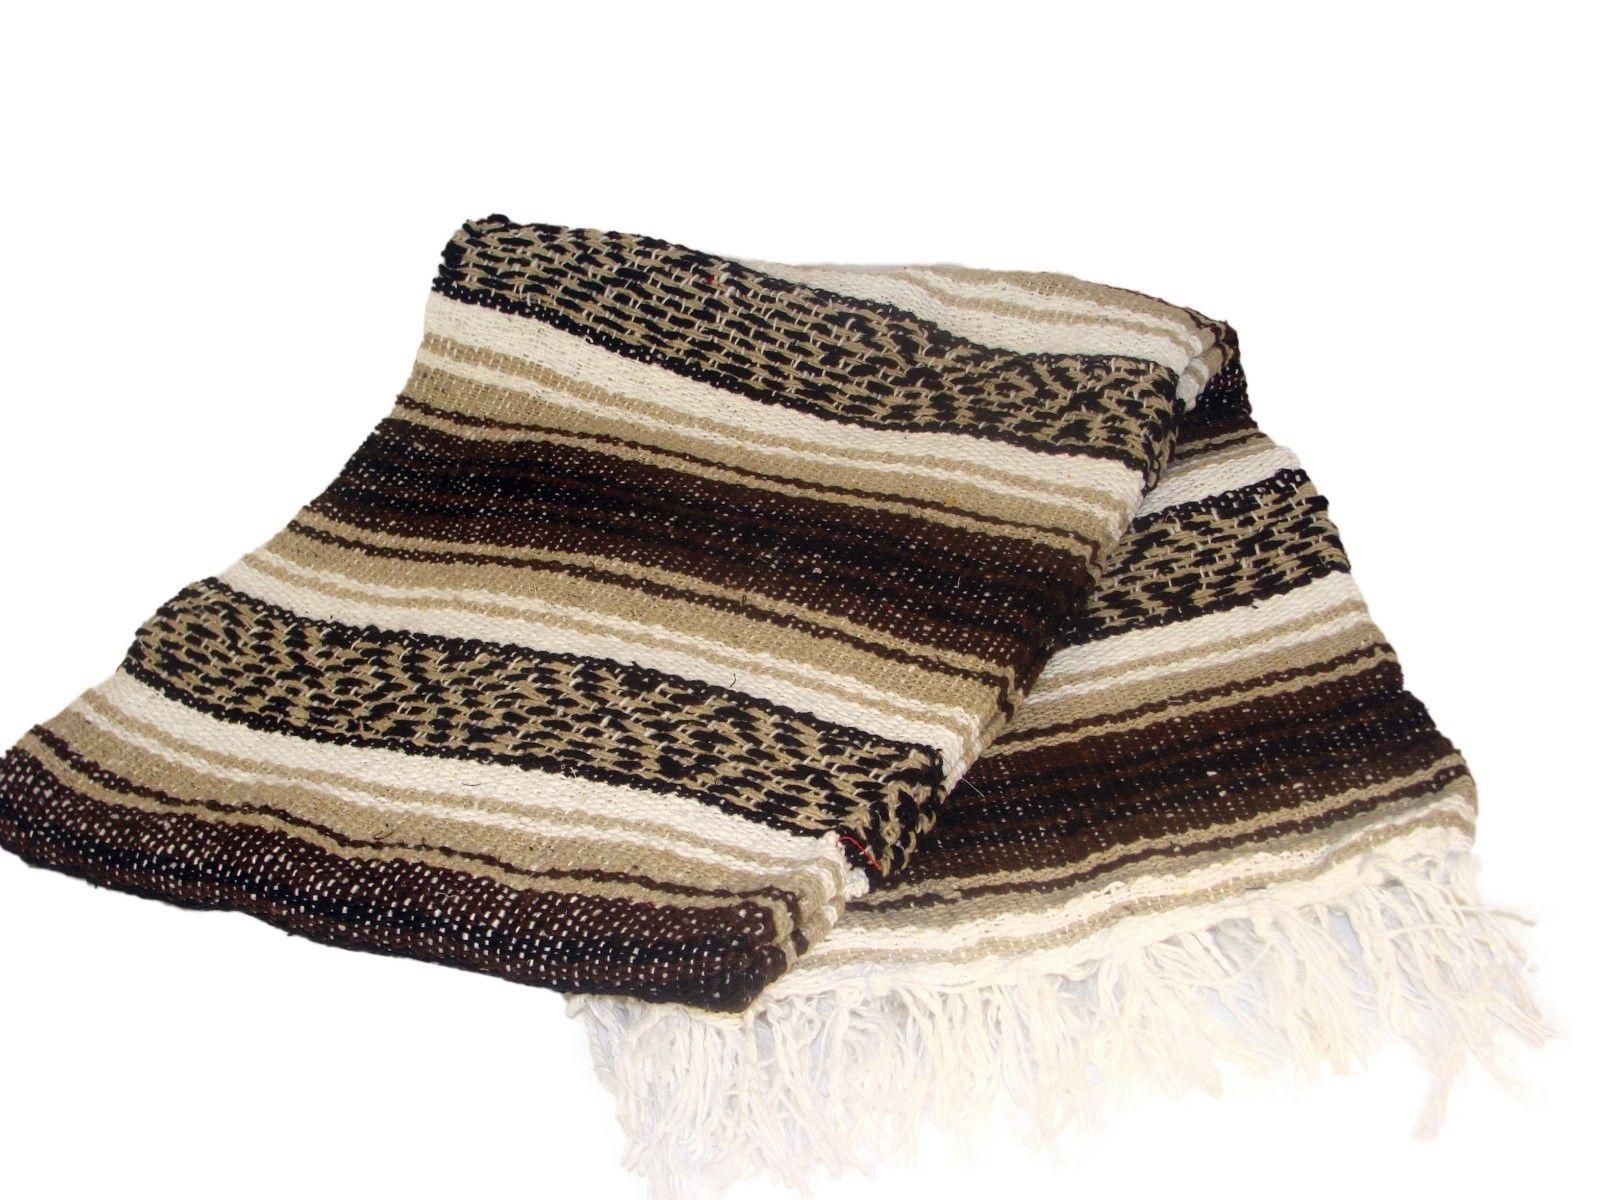 #11 Two 2 Falsa Tourist Mexican Travel Blanket Yoga Throw Picnic Snuggle Afghan